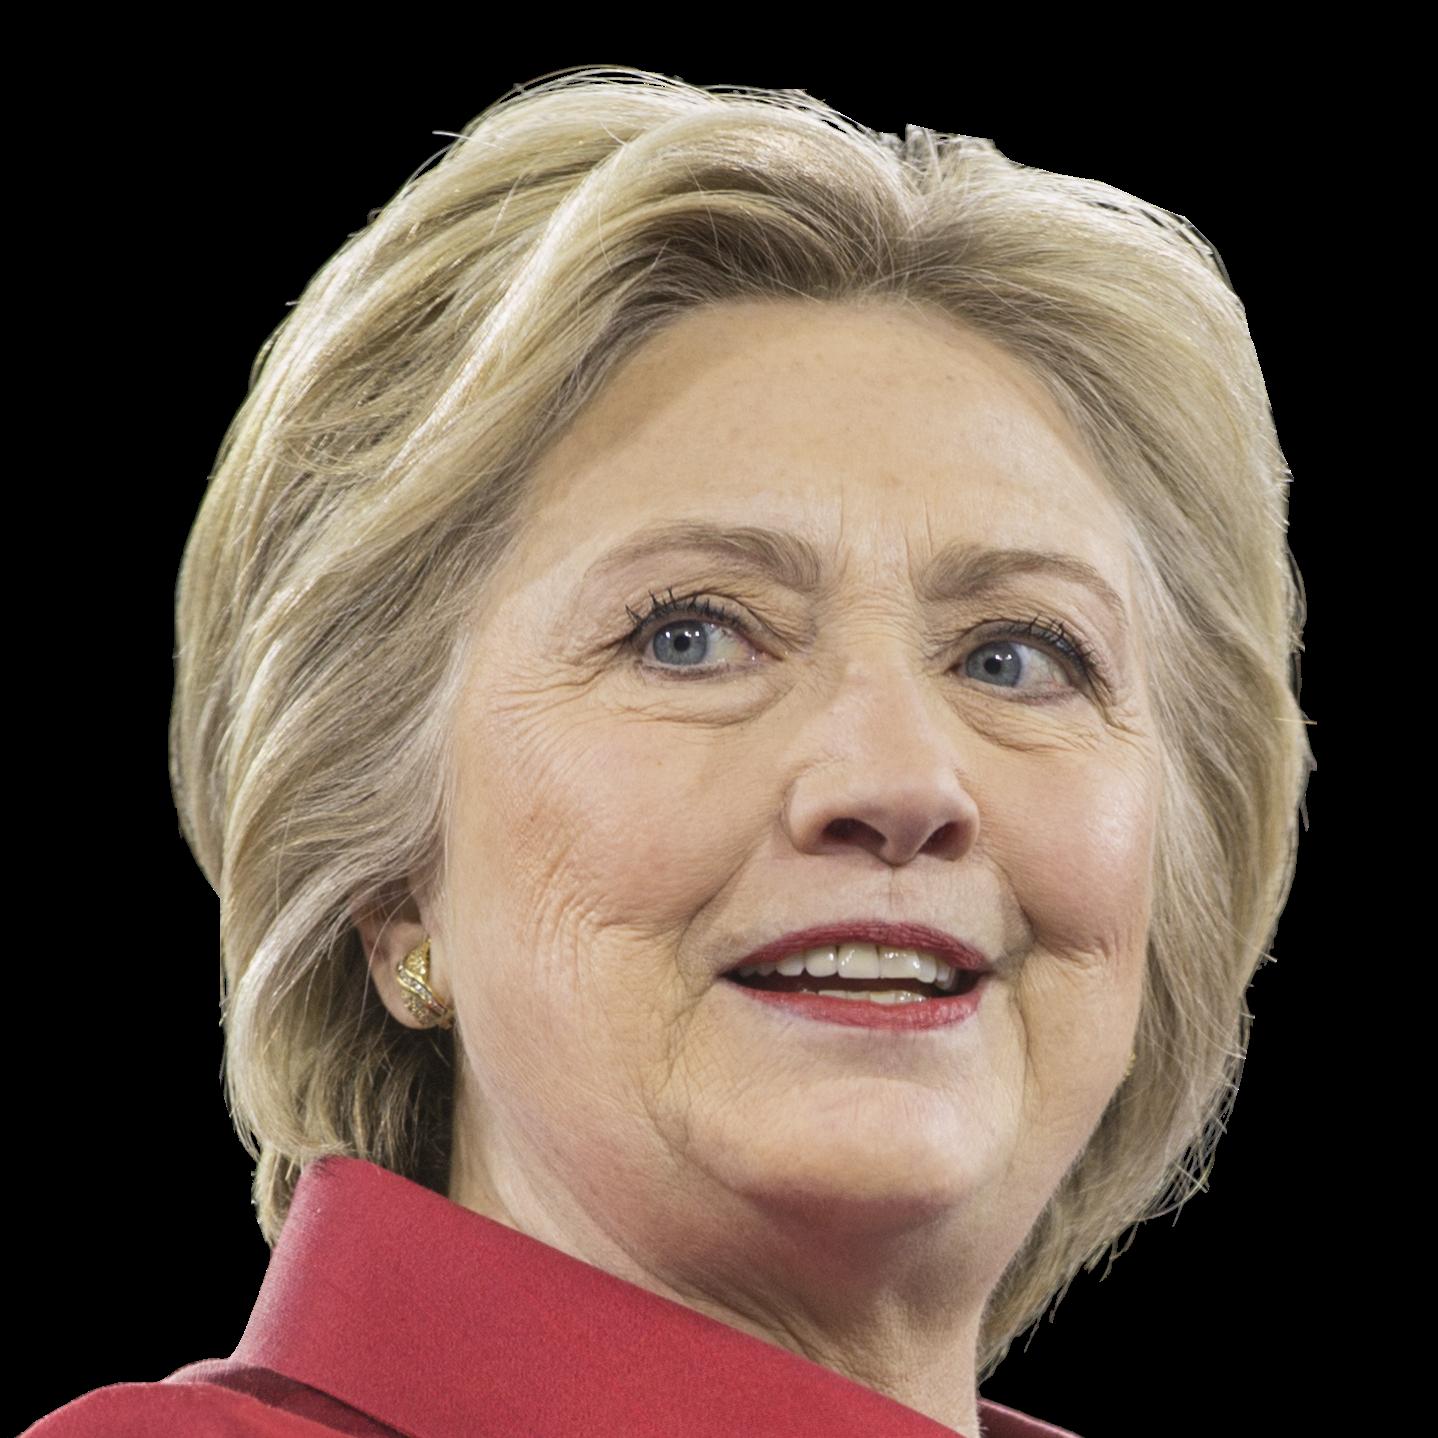 File:Hillary Clinton AIPAC 2016 Speech.png.